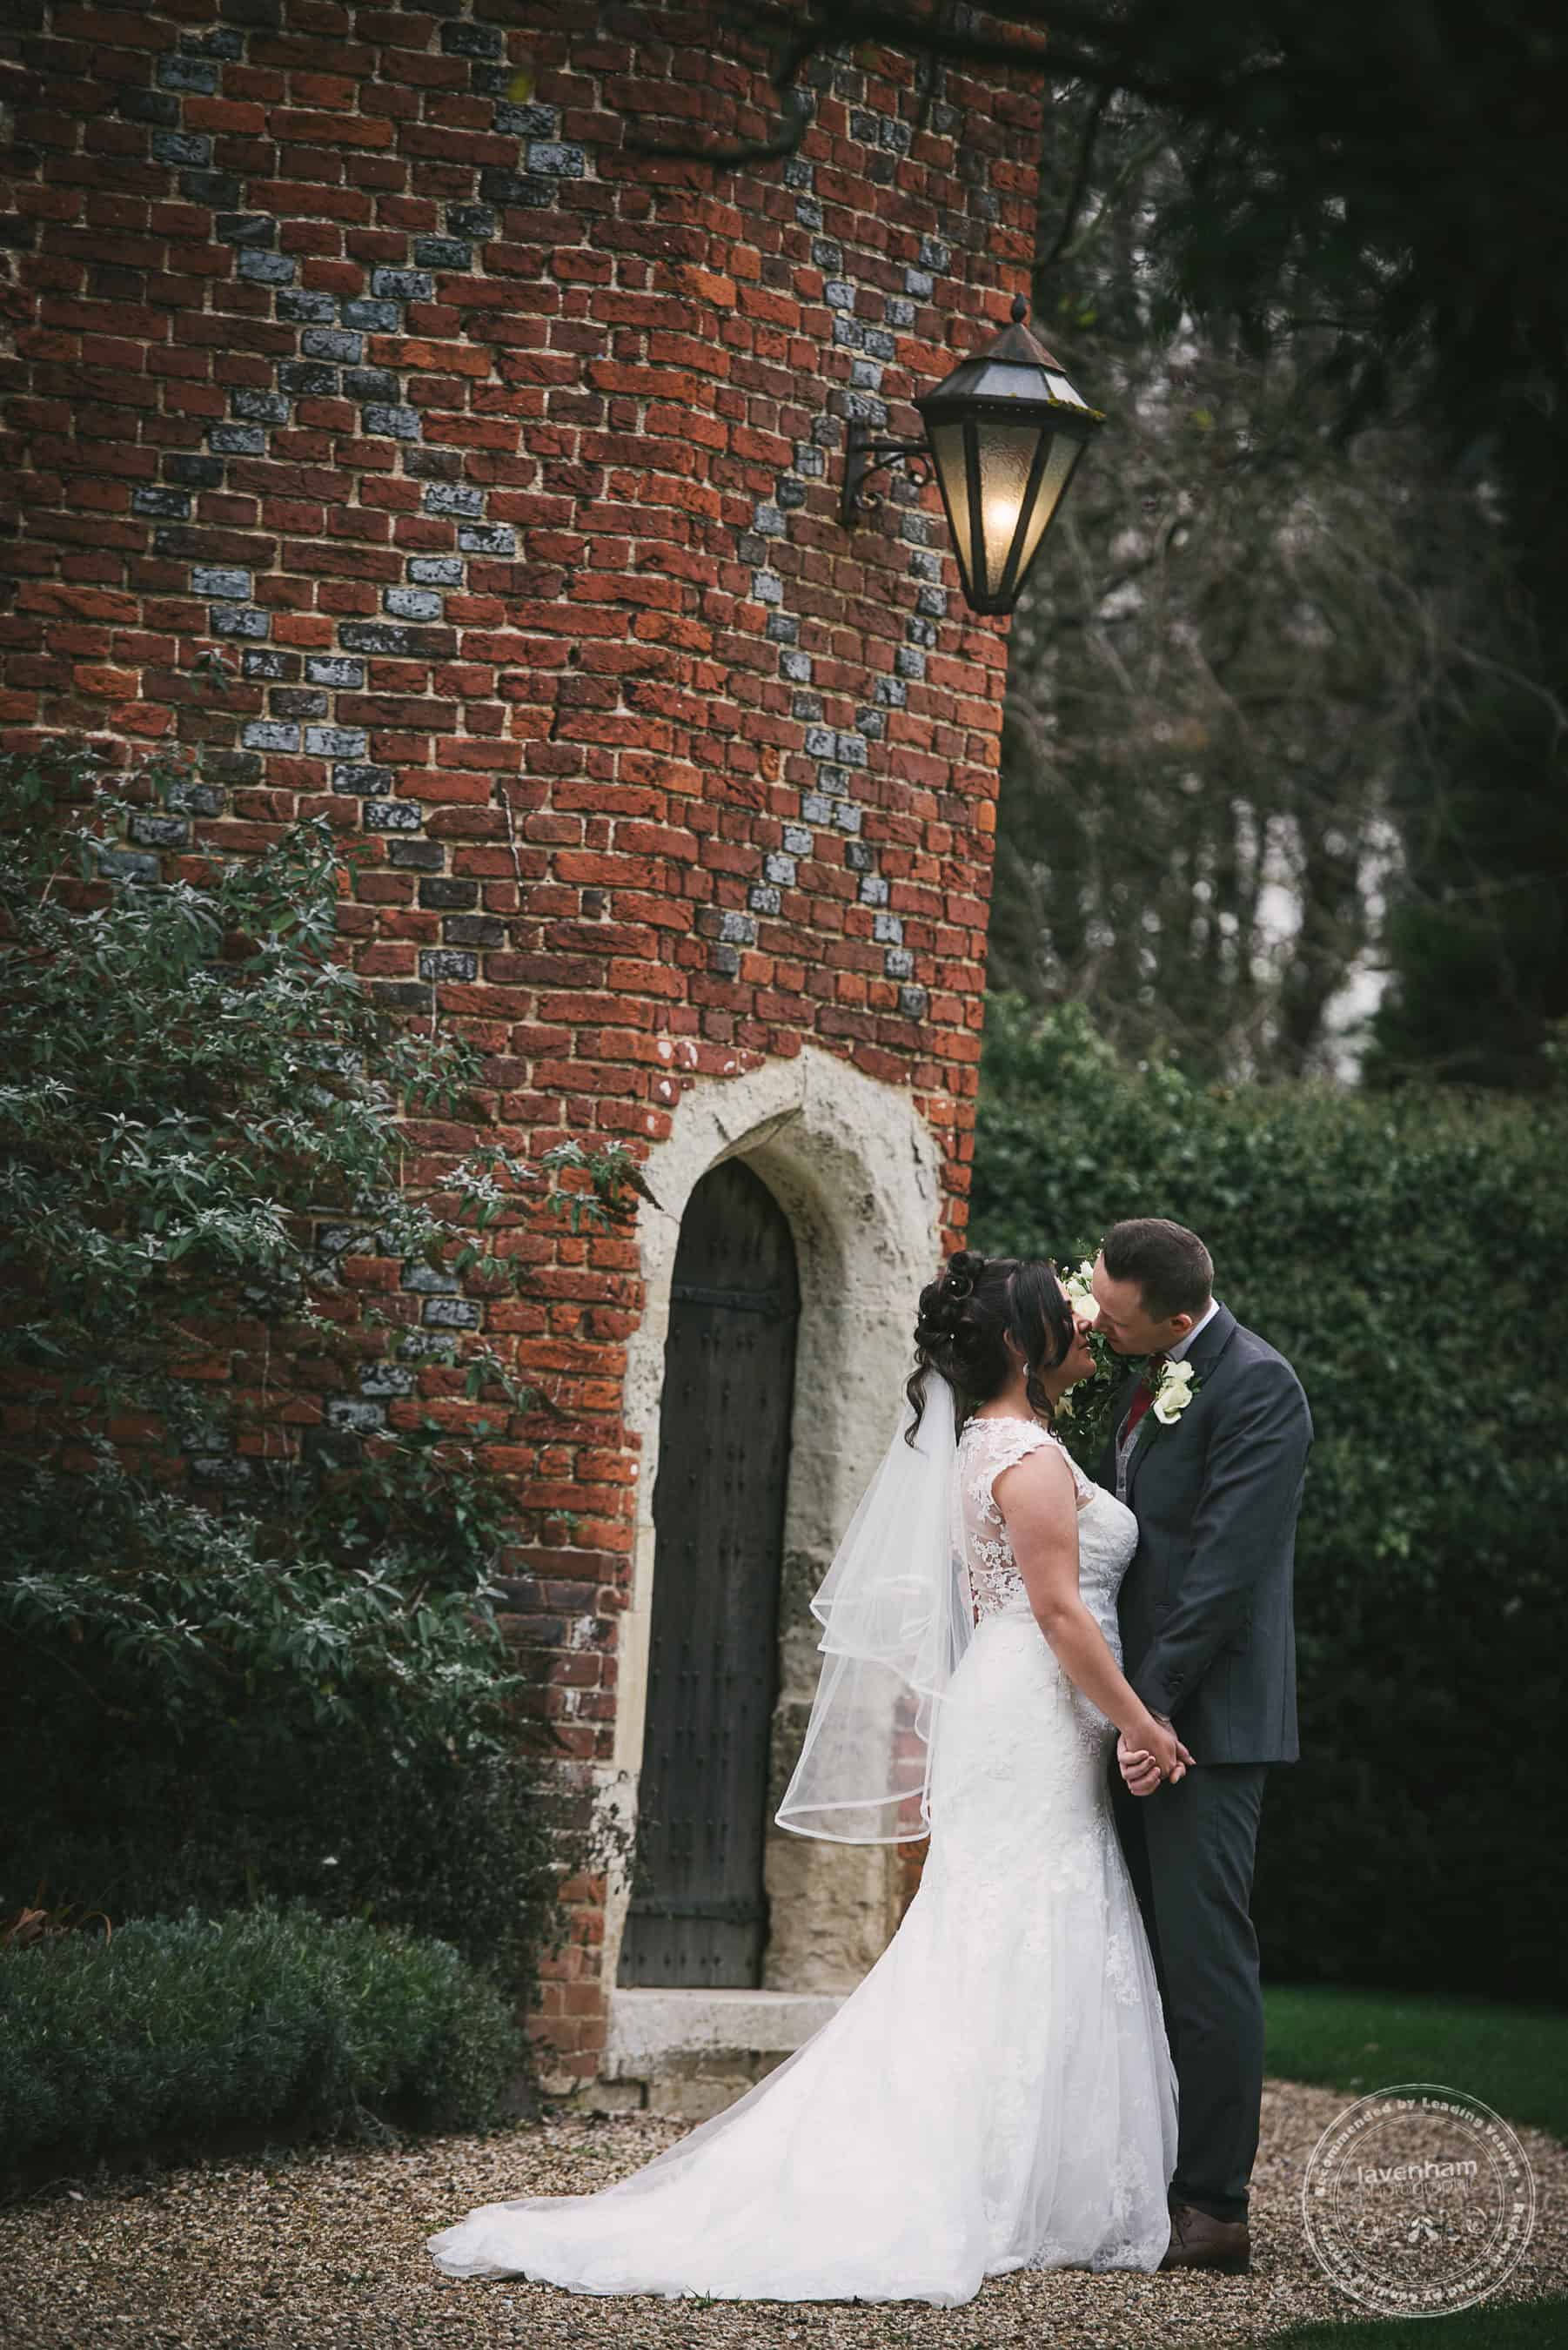 251118 Leez Priory Wedding Photography by Lavenham Photographic 082